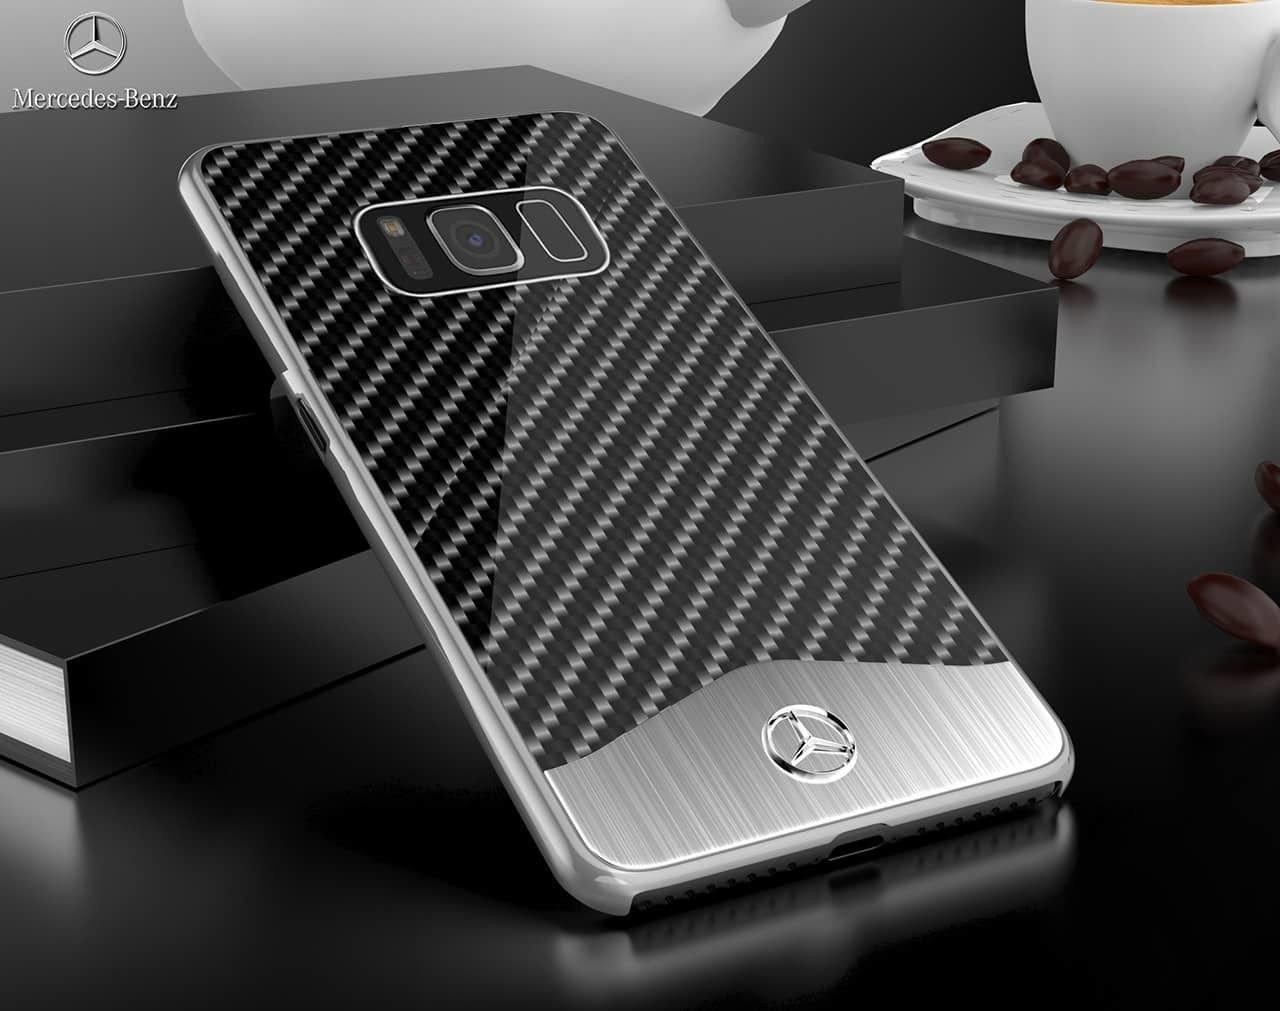 Mercedes Benz 174 Samsung Galaxy S8 Plus Slr Mclaren Carbon Fibre Limited Edition Electroplated